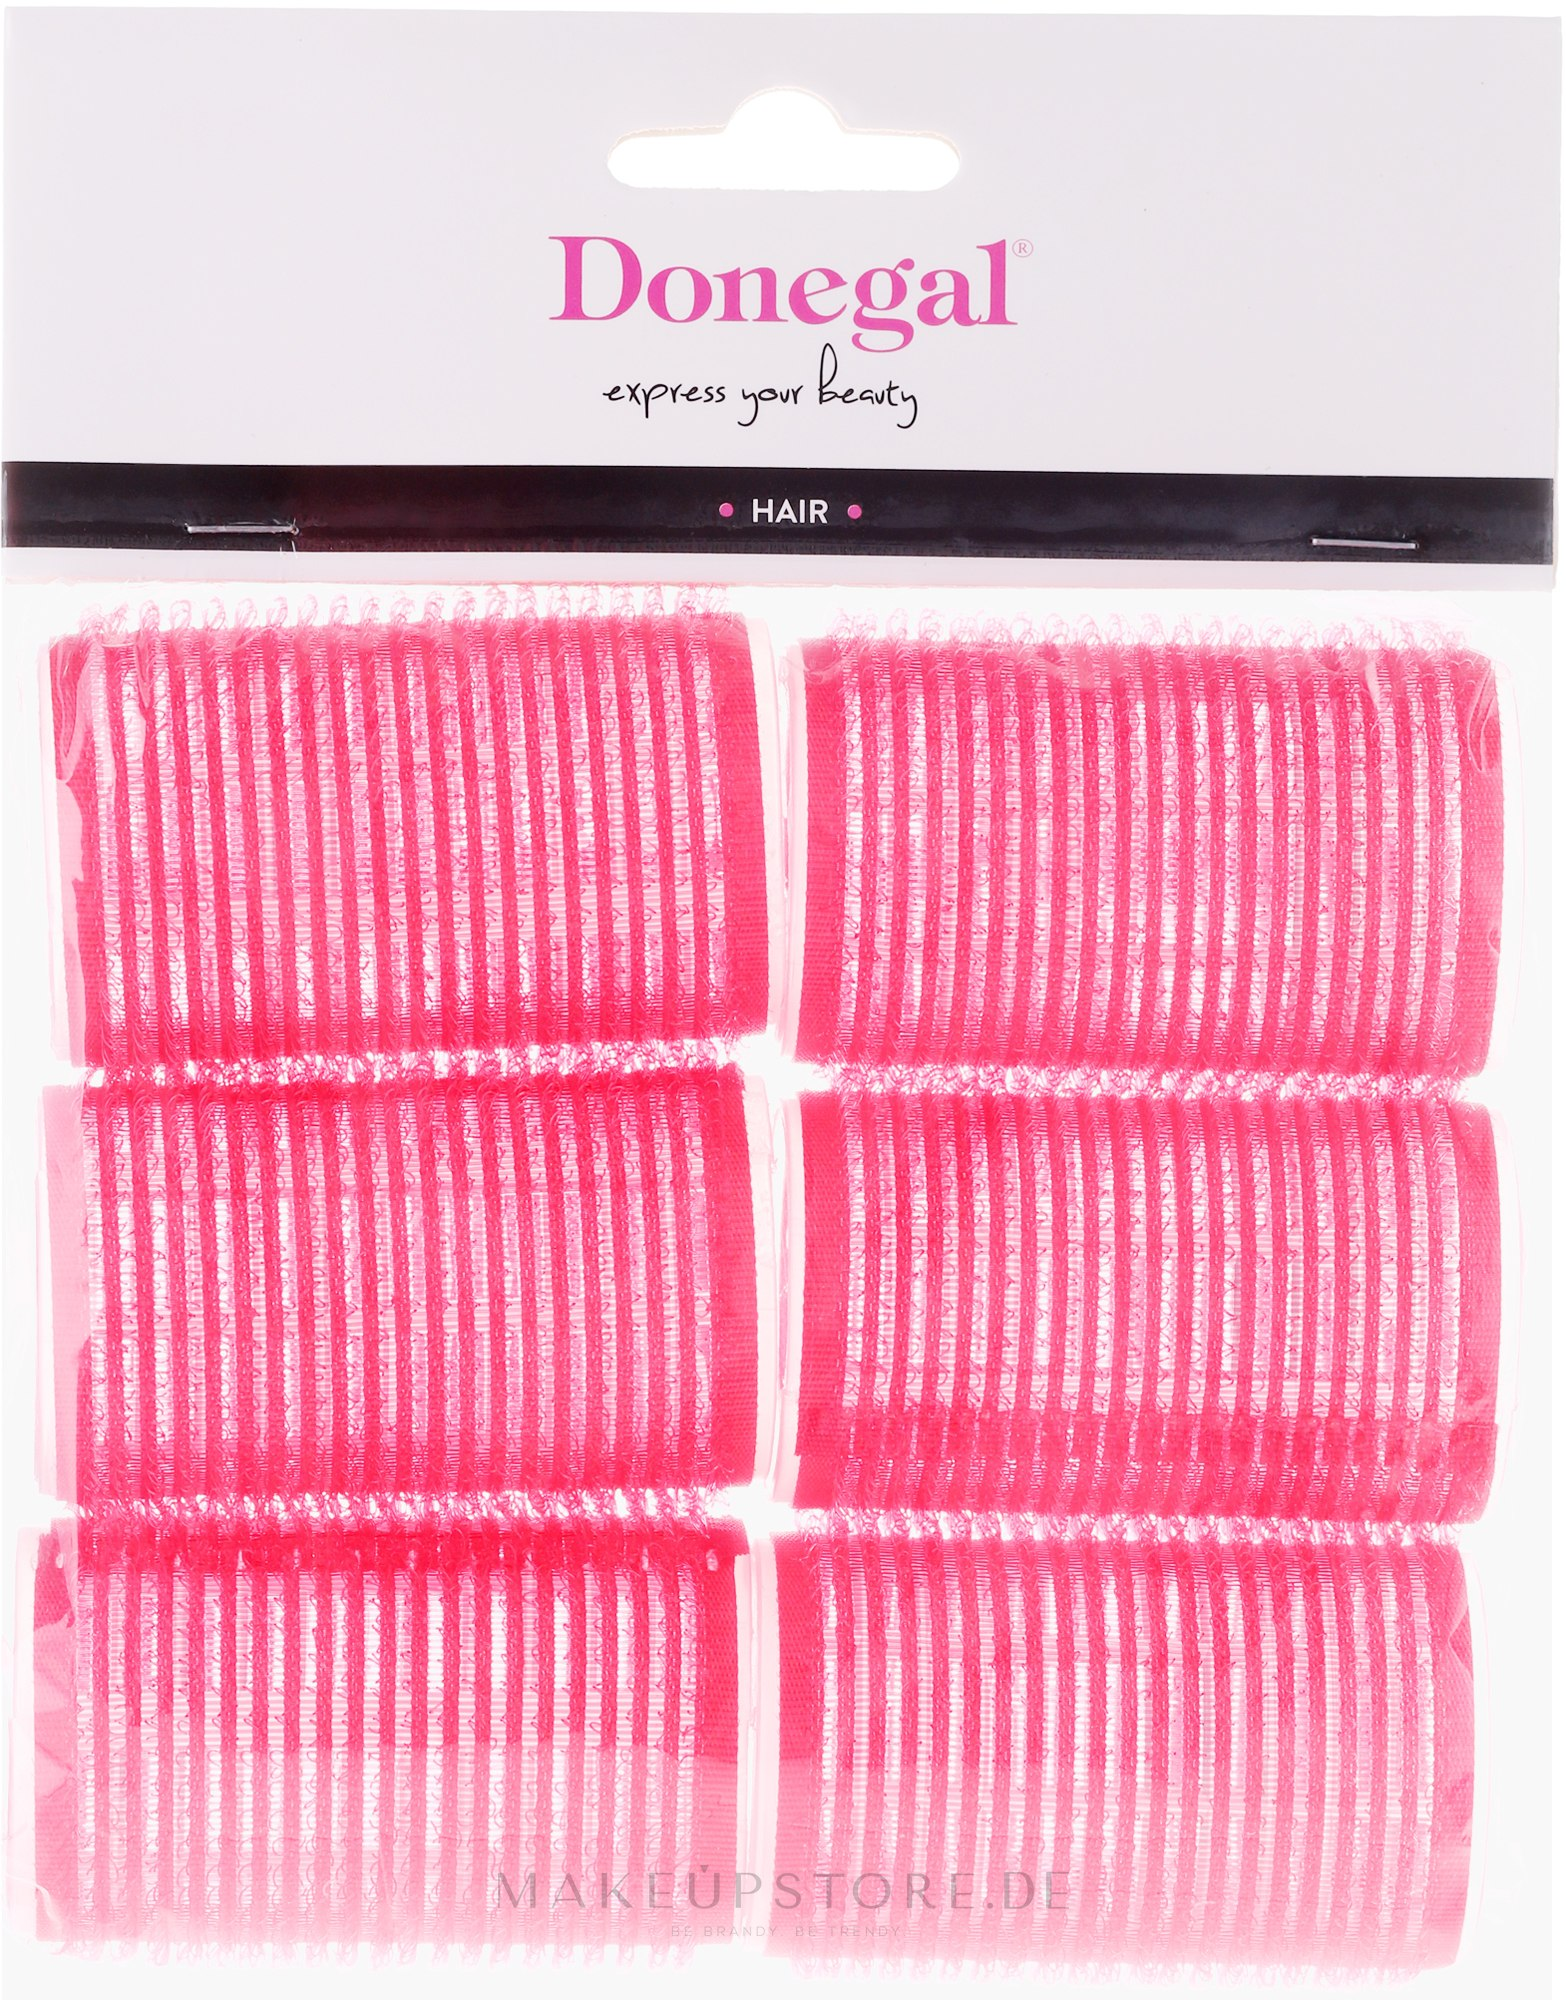 Klettwickler 36 mm 6 St. - Donegal Hair Curlers — Bild 6 St..